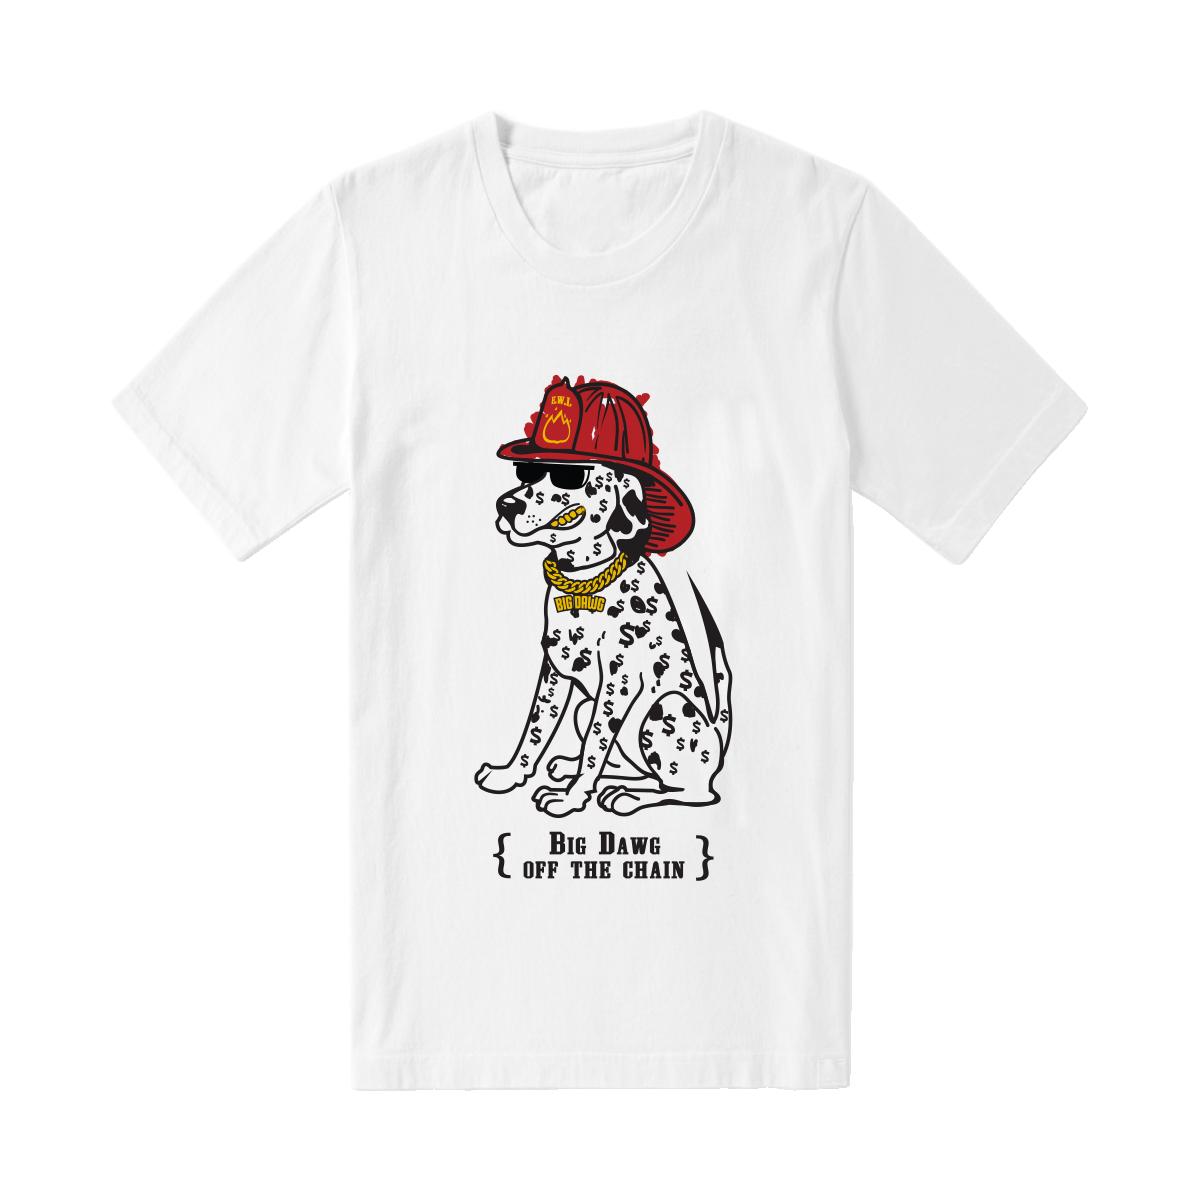 Big Dawg T-Shirt